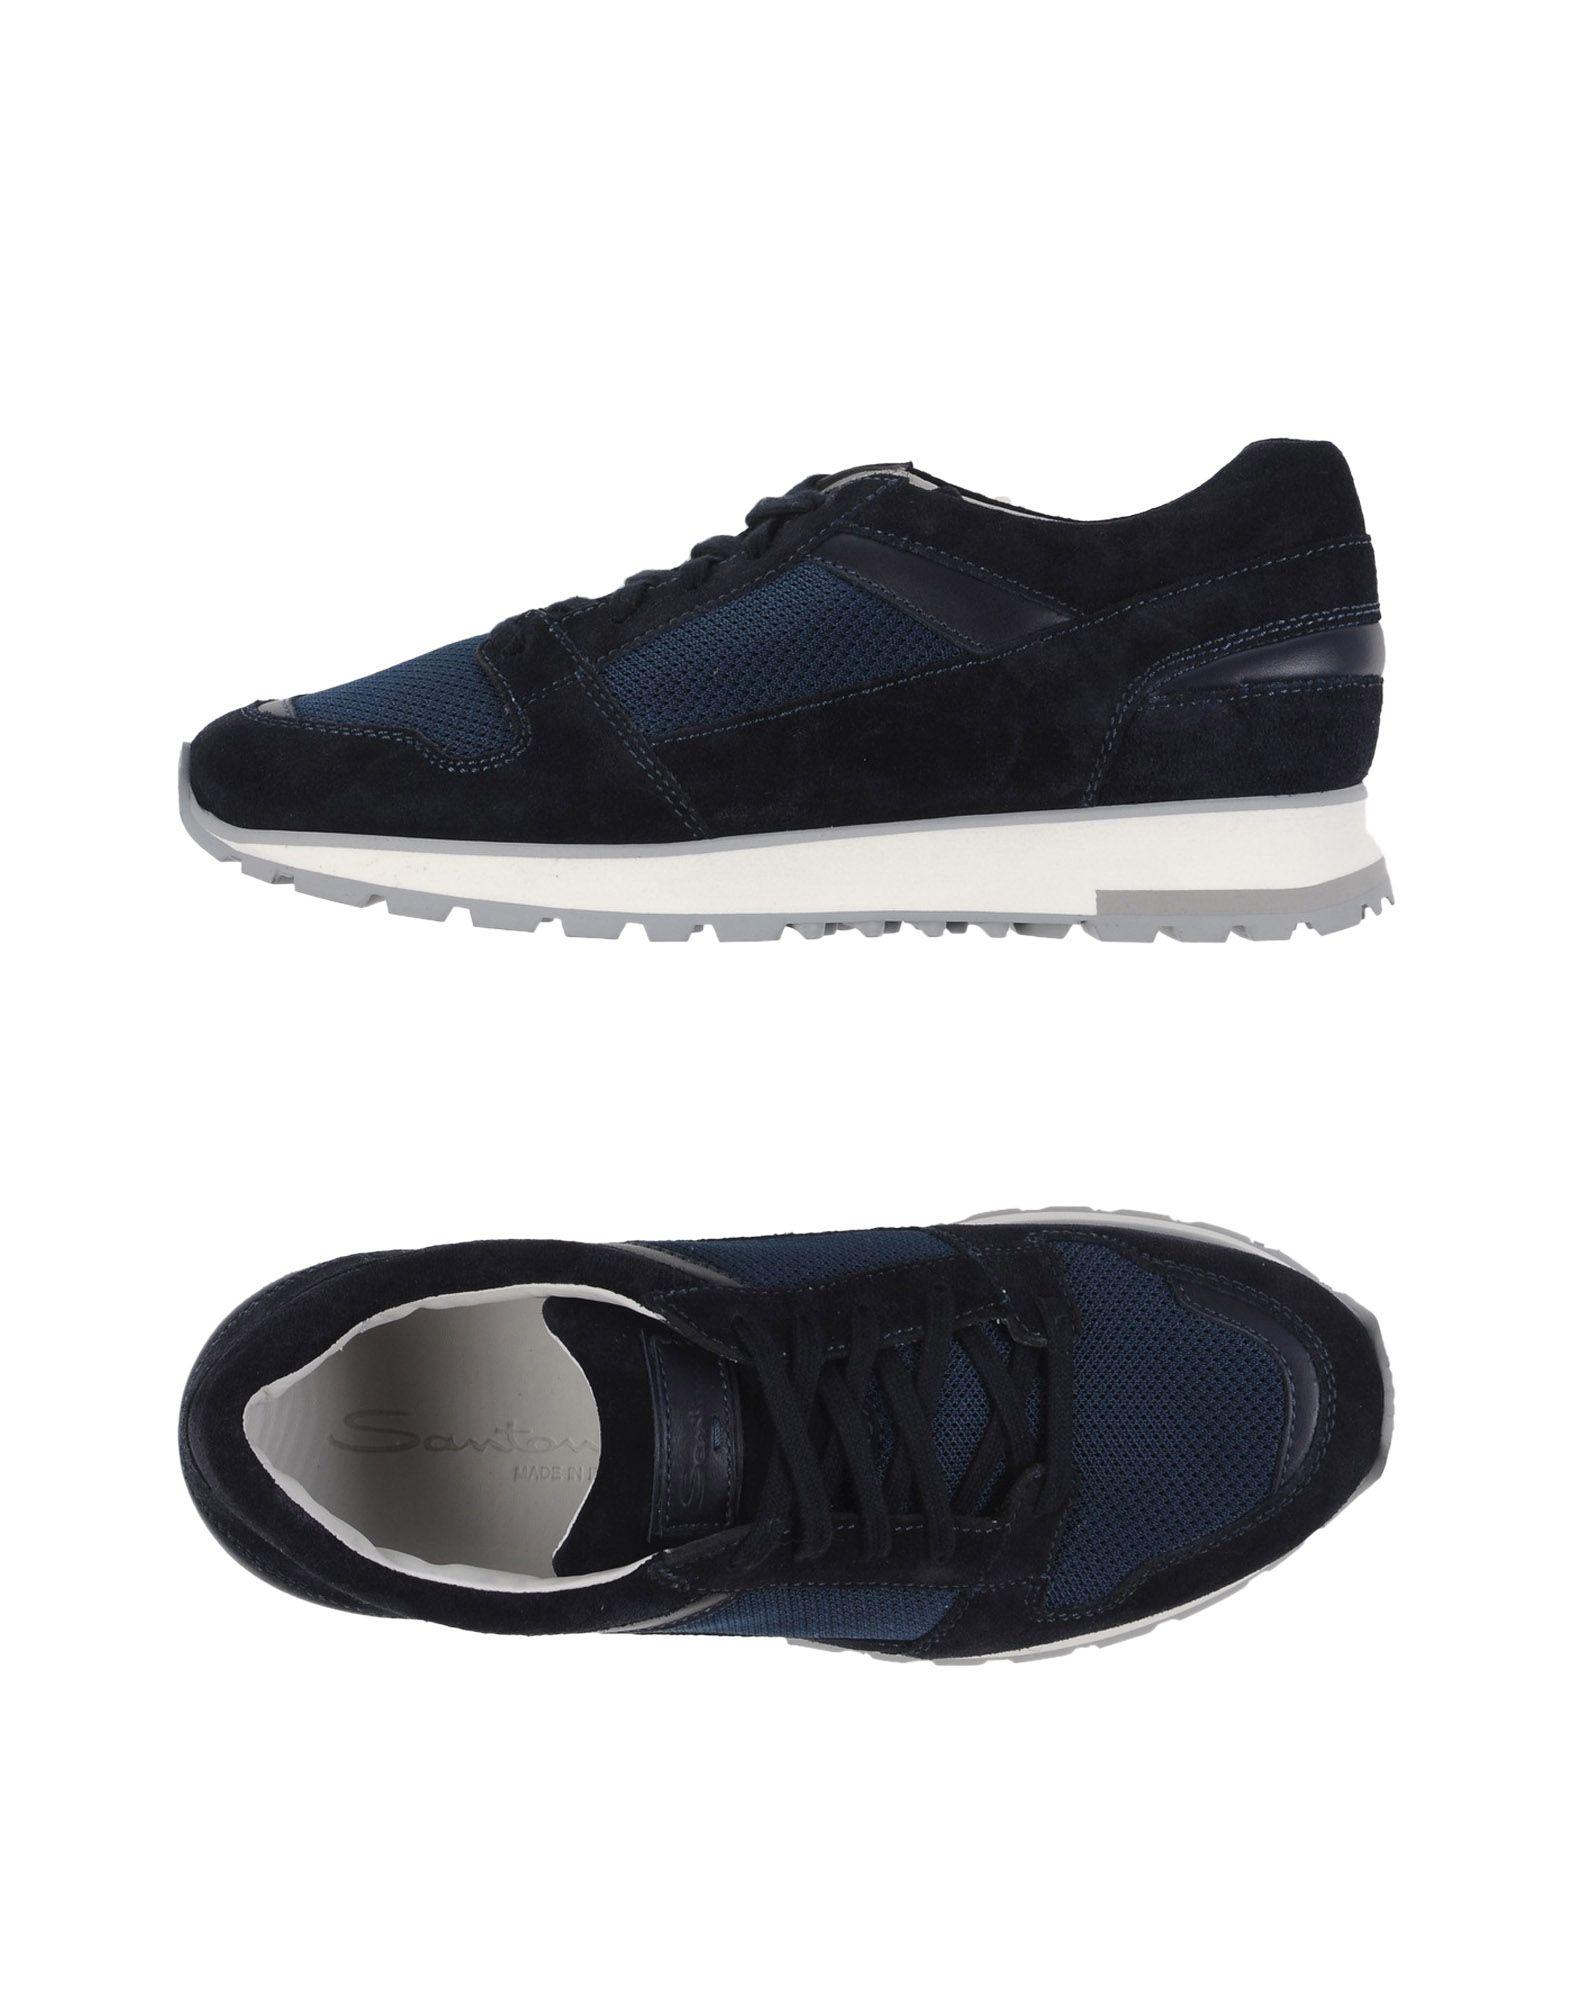 Günstige und modische Schuhe Santoni Sneakers Herren  11199825MX